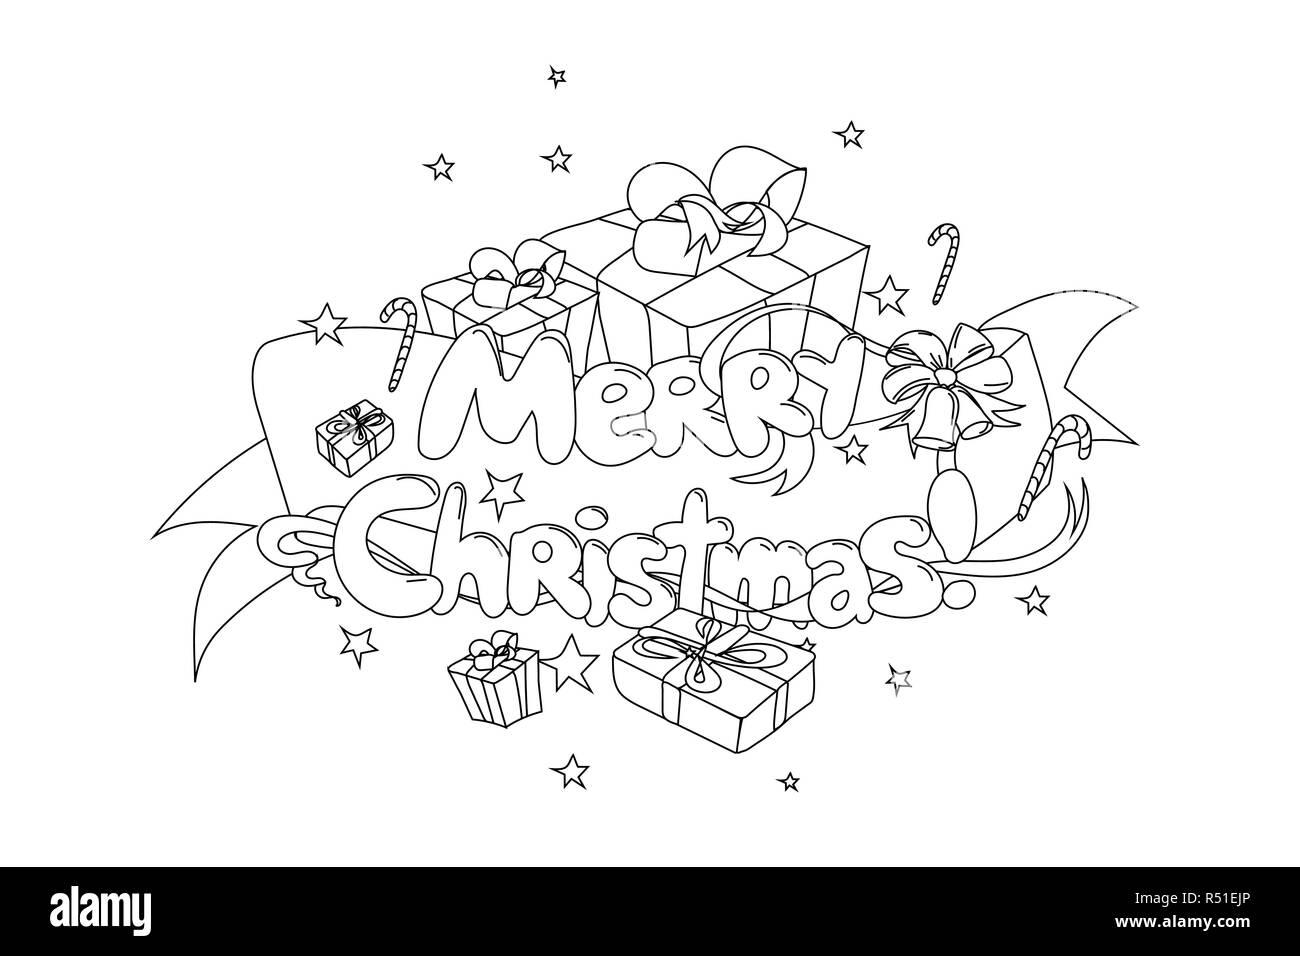 Joyeux Noël Part Drawned Vector Illustration Noir Et Blanc